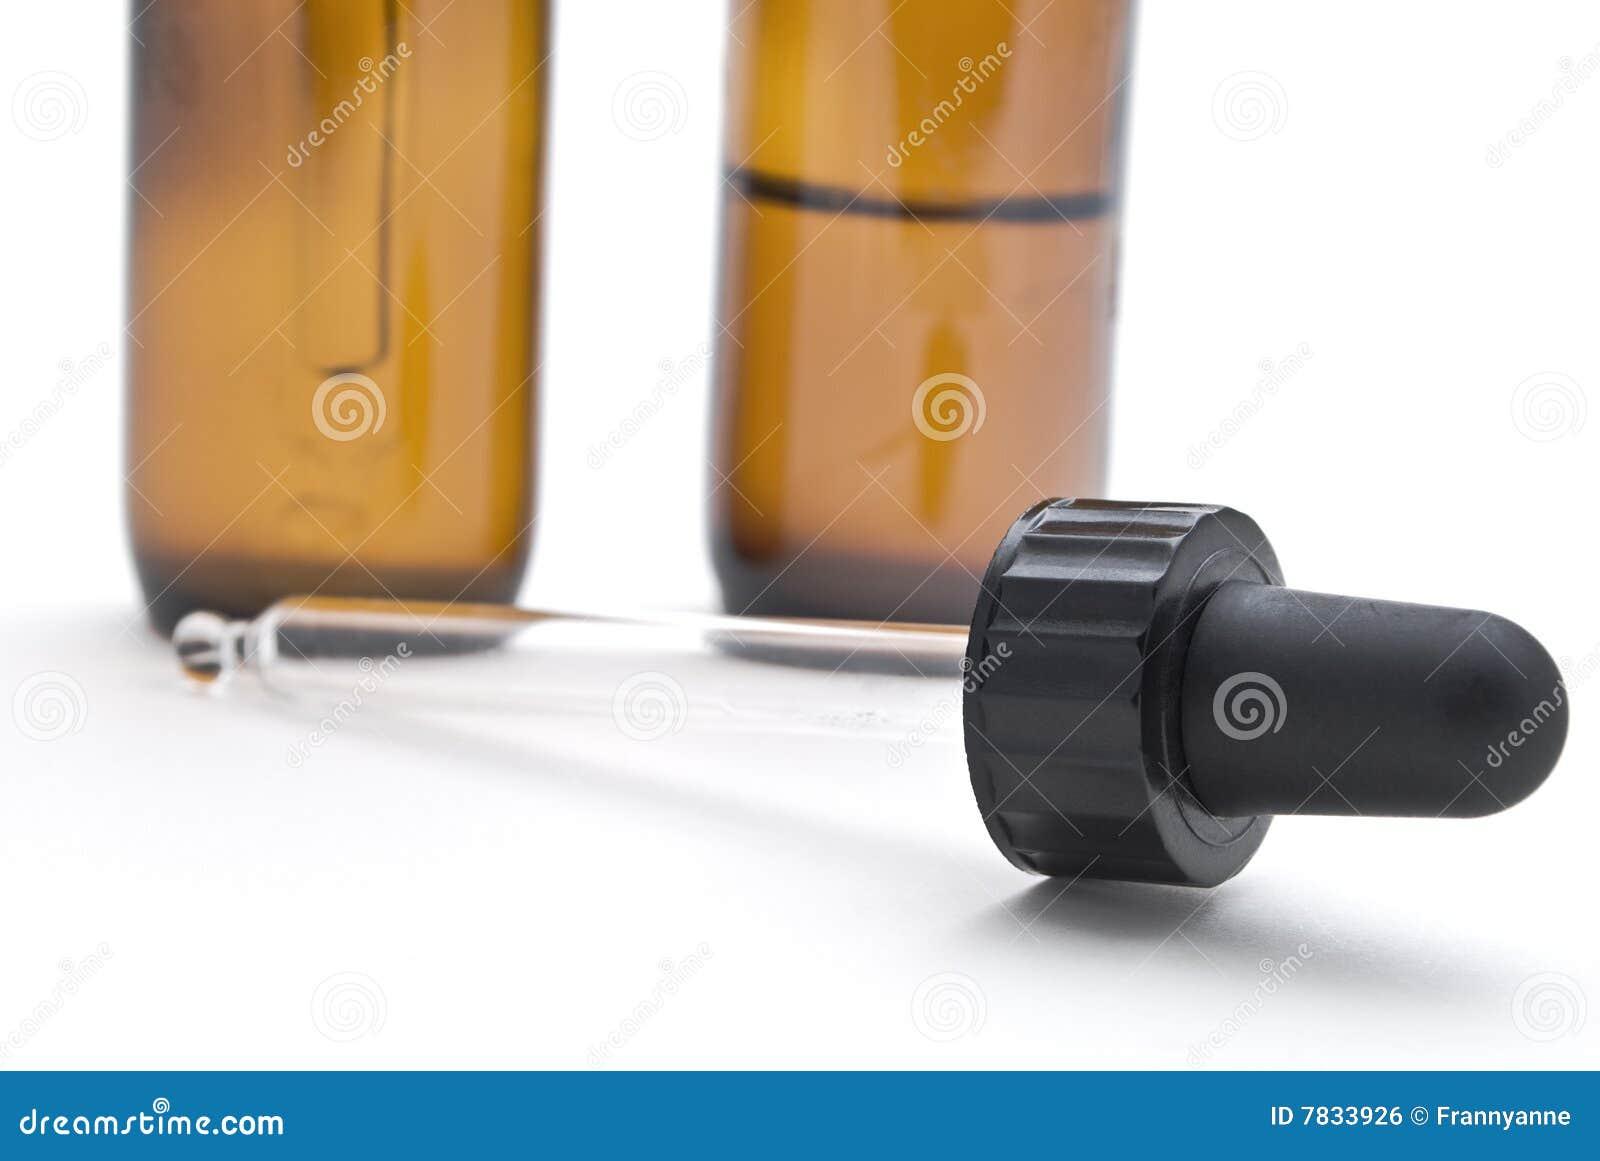 Flaskpipettetincture